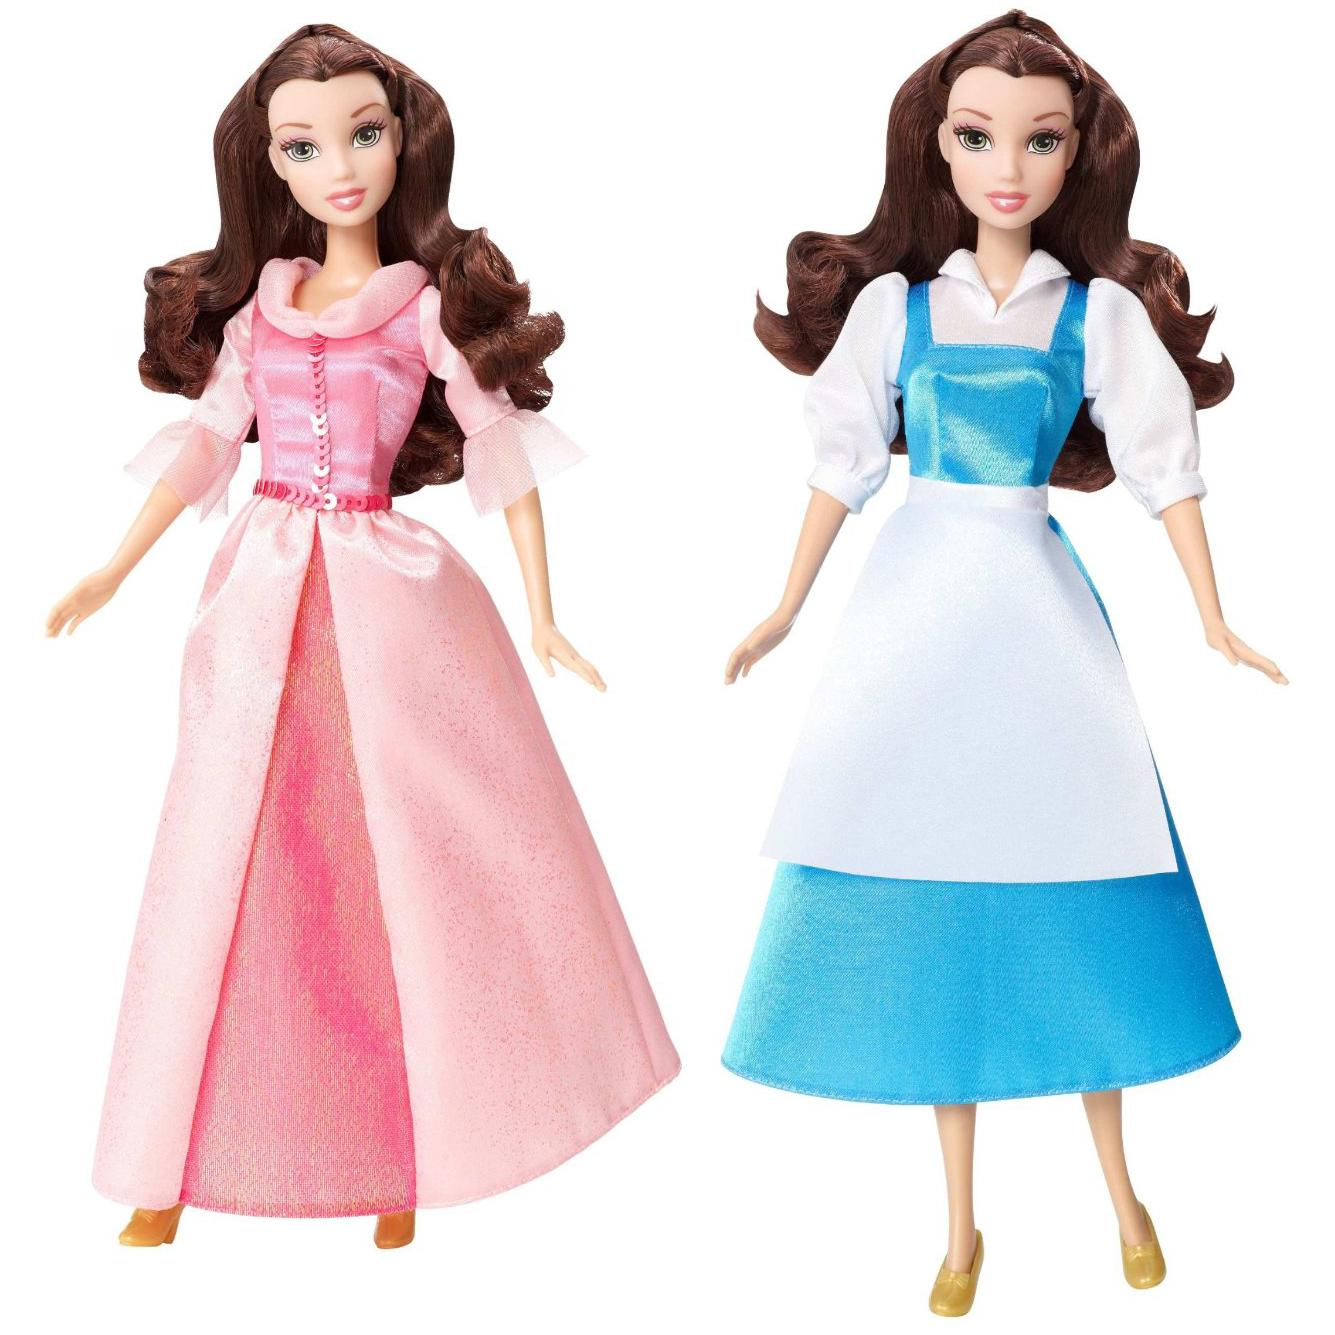 Disney Princess Doll Clothes